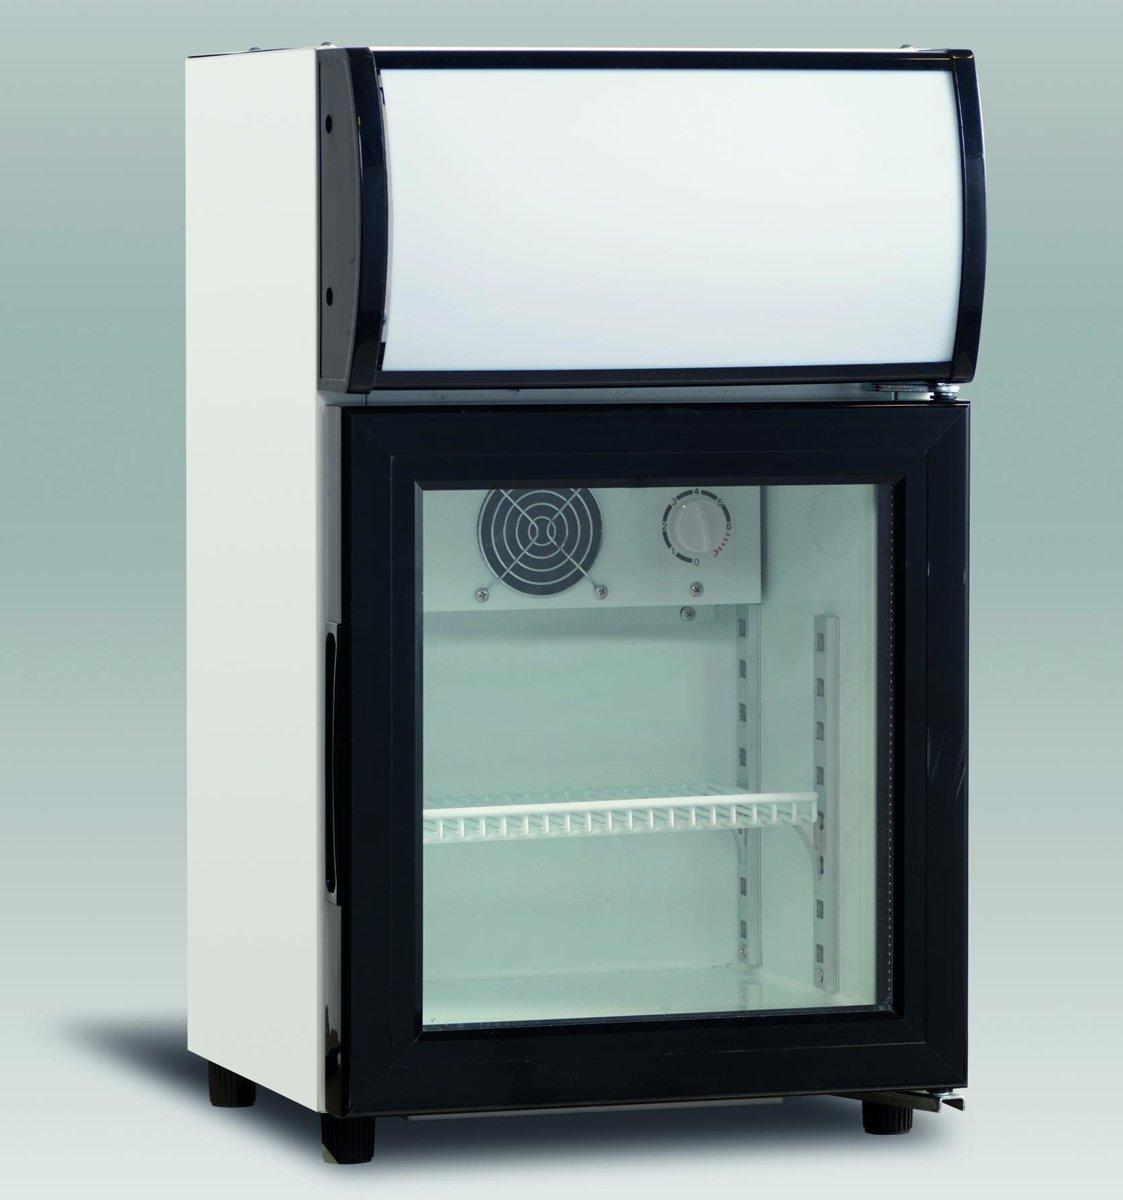 Scancool SC21 display koelkast (22 liter) kopen